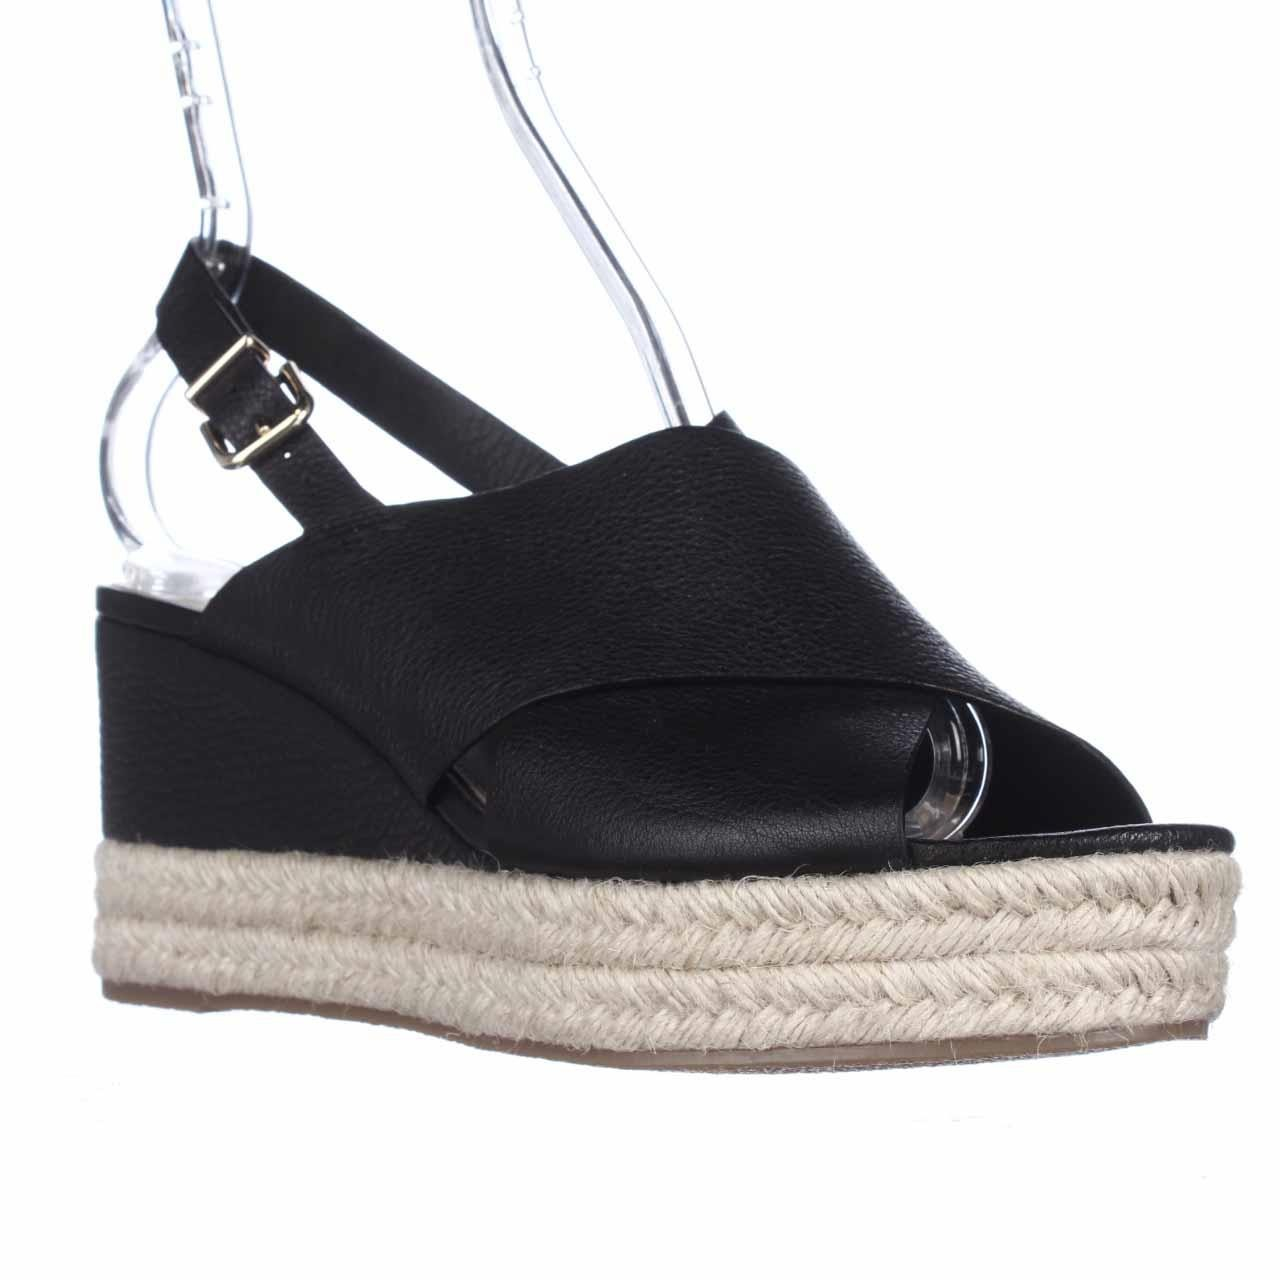 via spiga triana espadrille slingback wedge sandals in